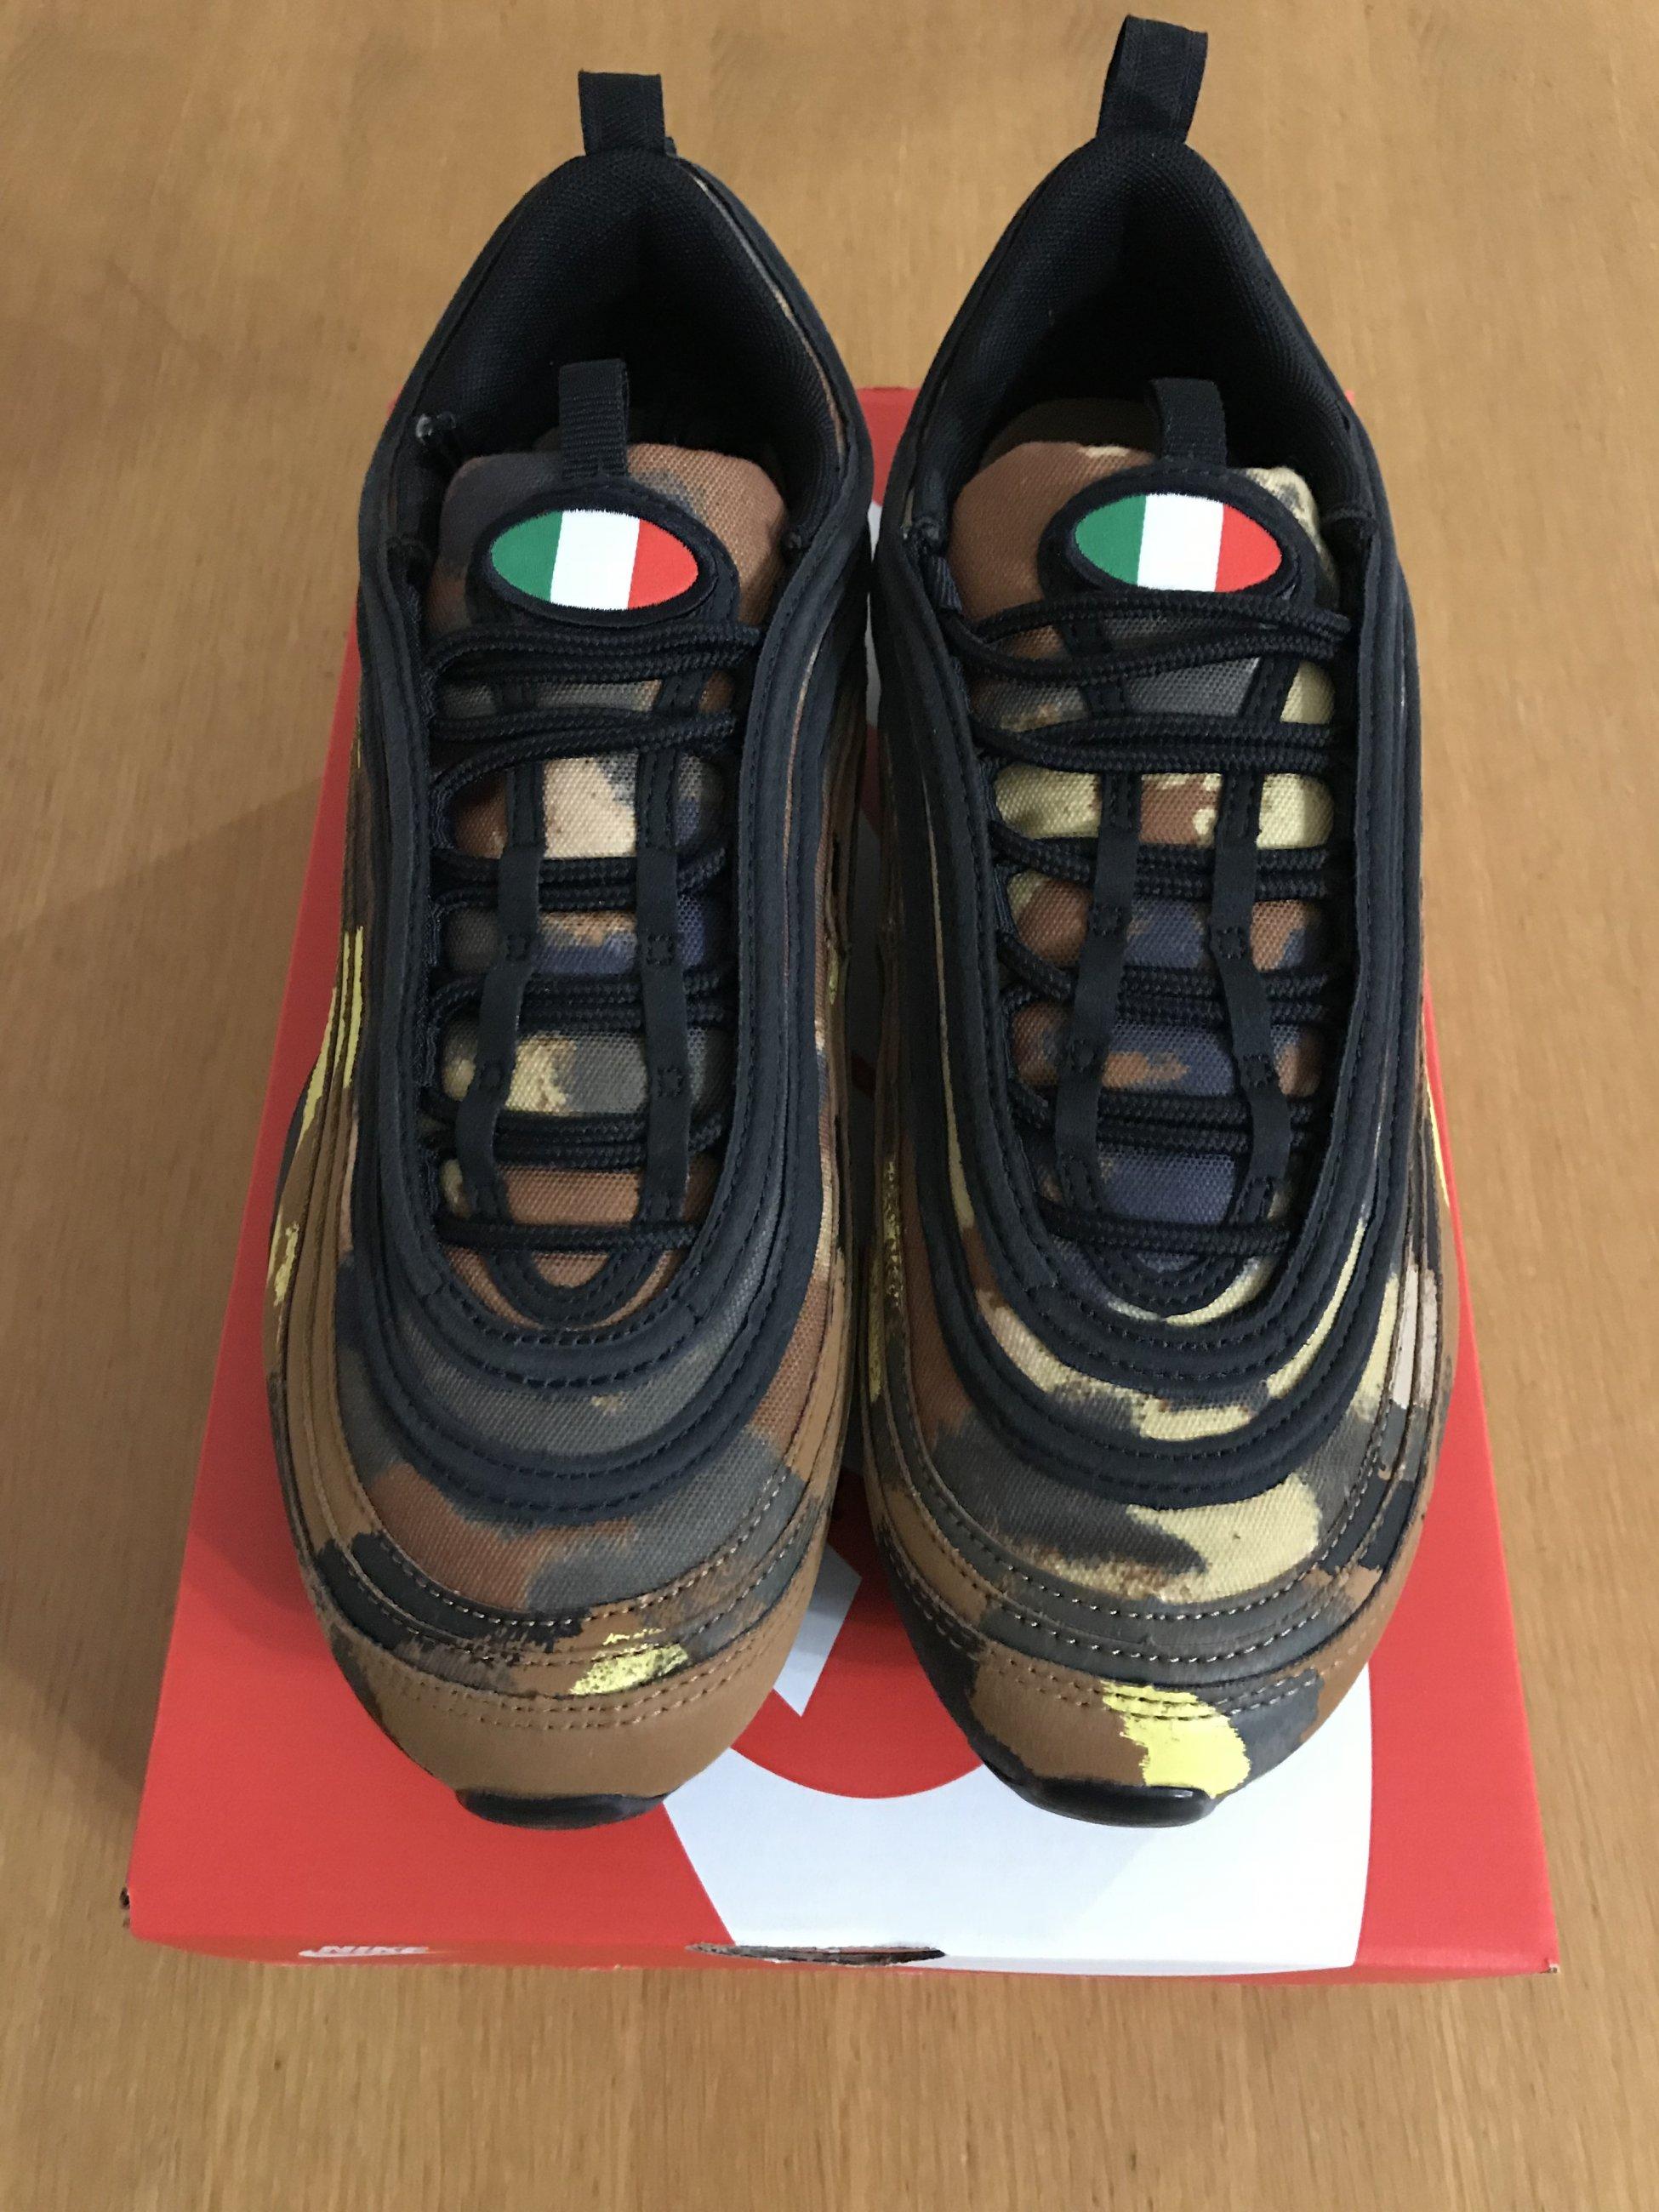 00dd50197 Nike Air Max 97 Premium QS international camo italy Edizione italiana Size  42,5